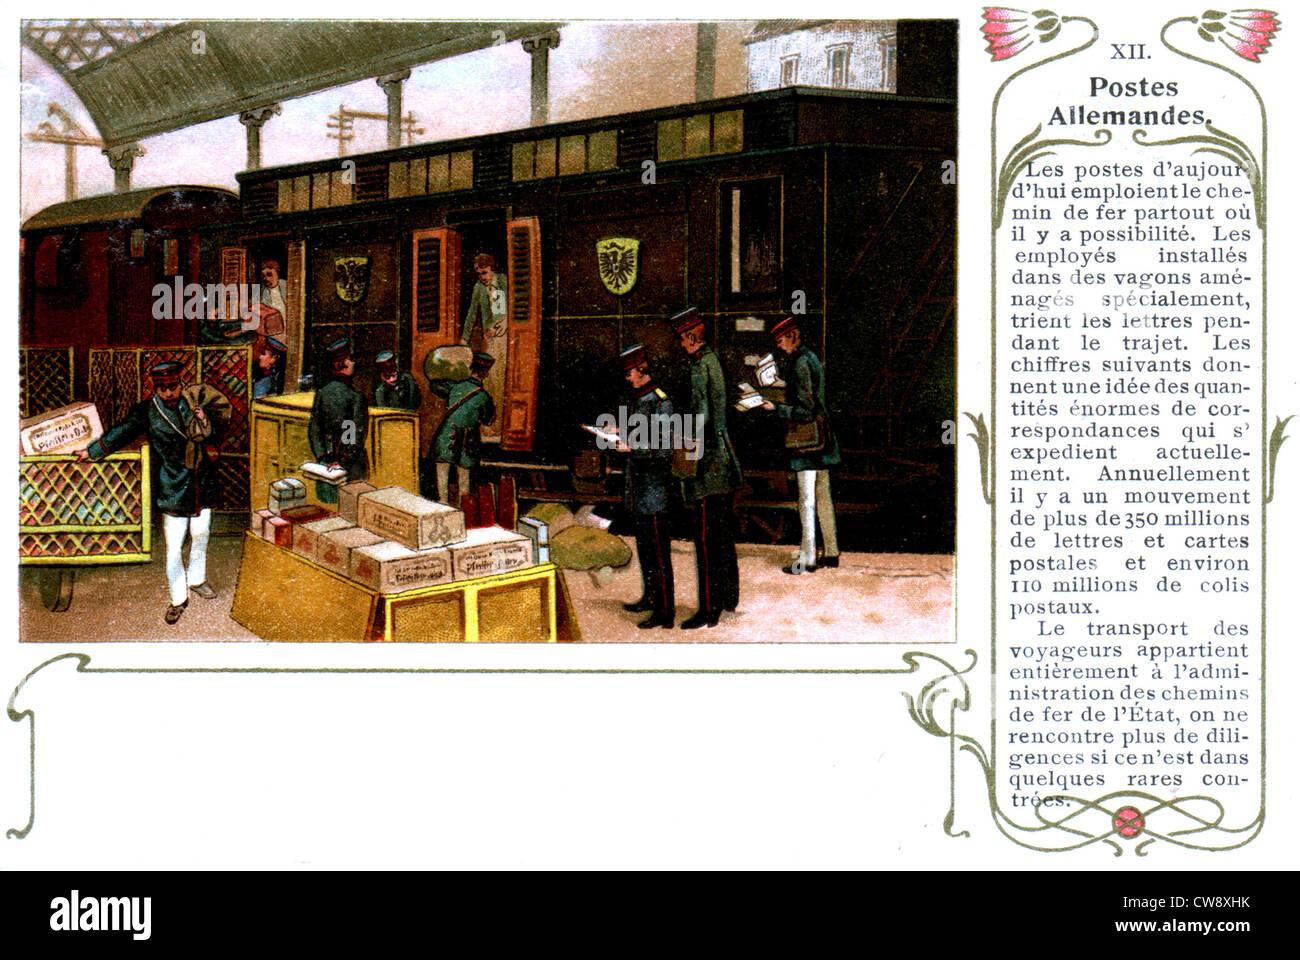 Organization of the postal service - Stock Image